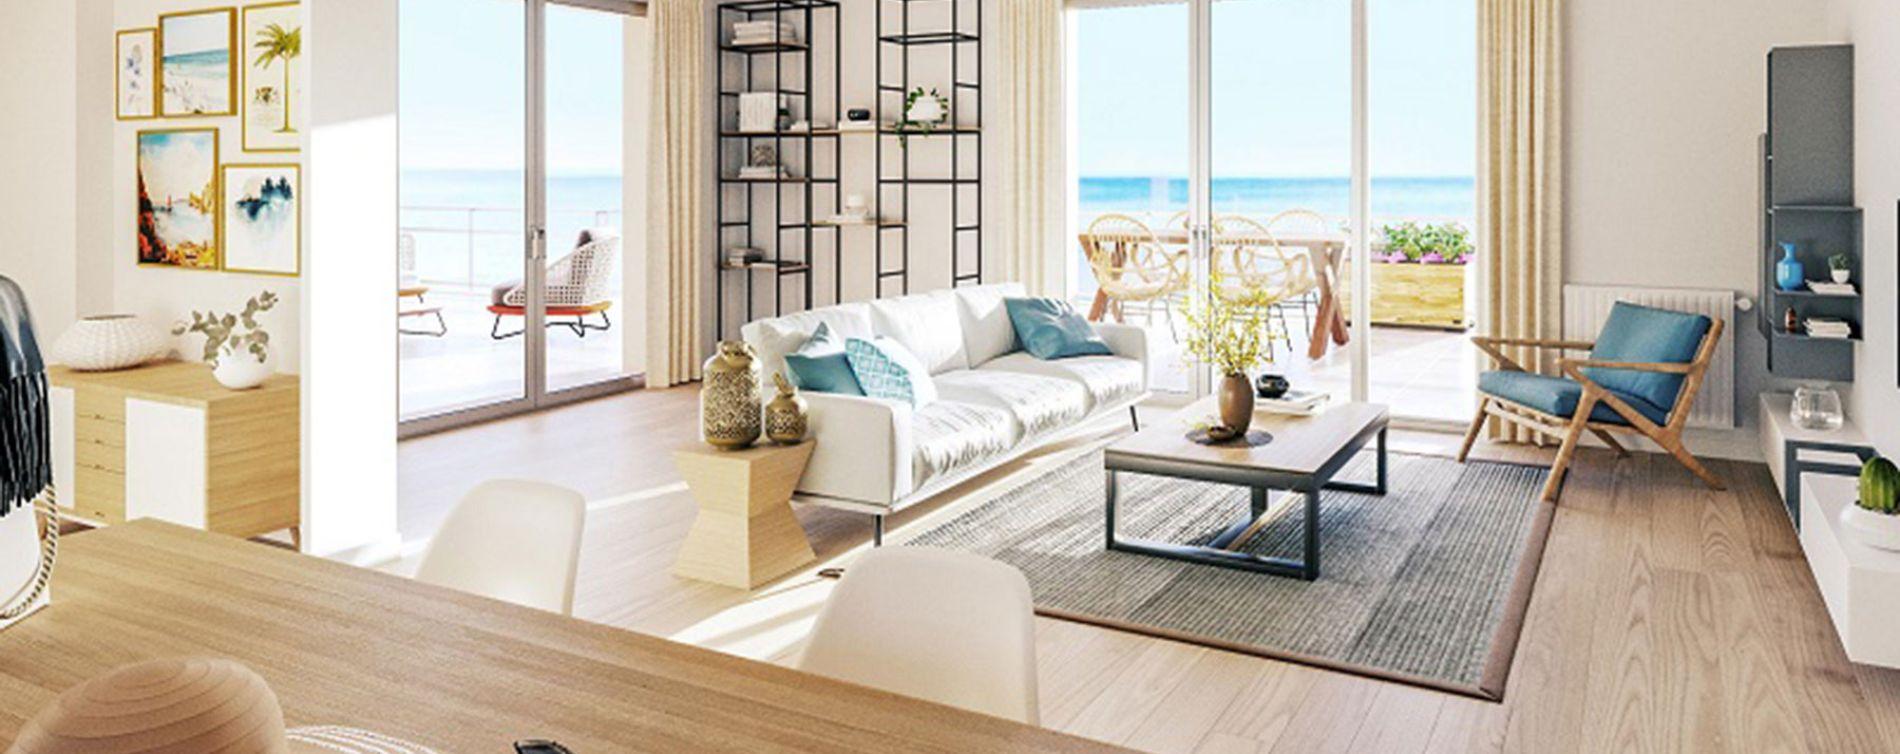 Cucq : programme immobilier neuve « Face Mer » (3)